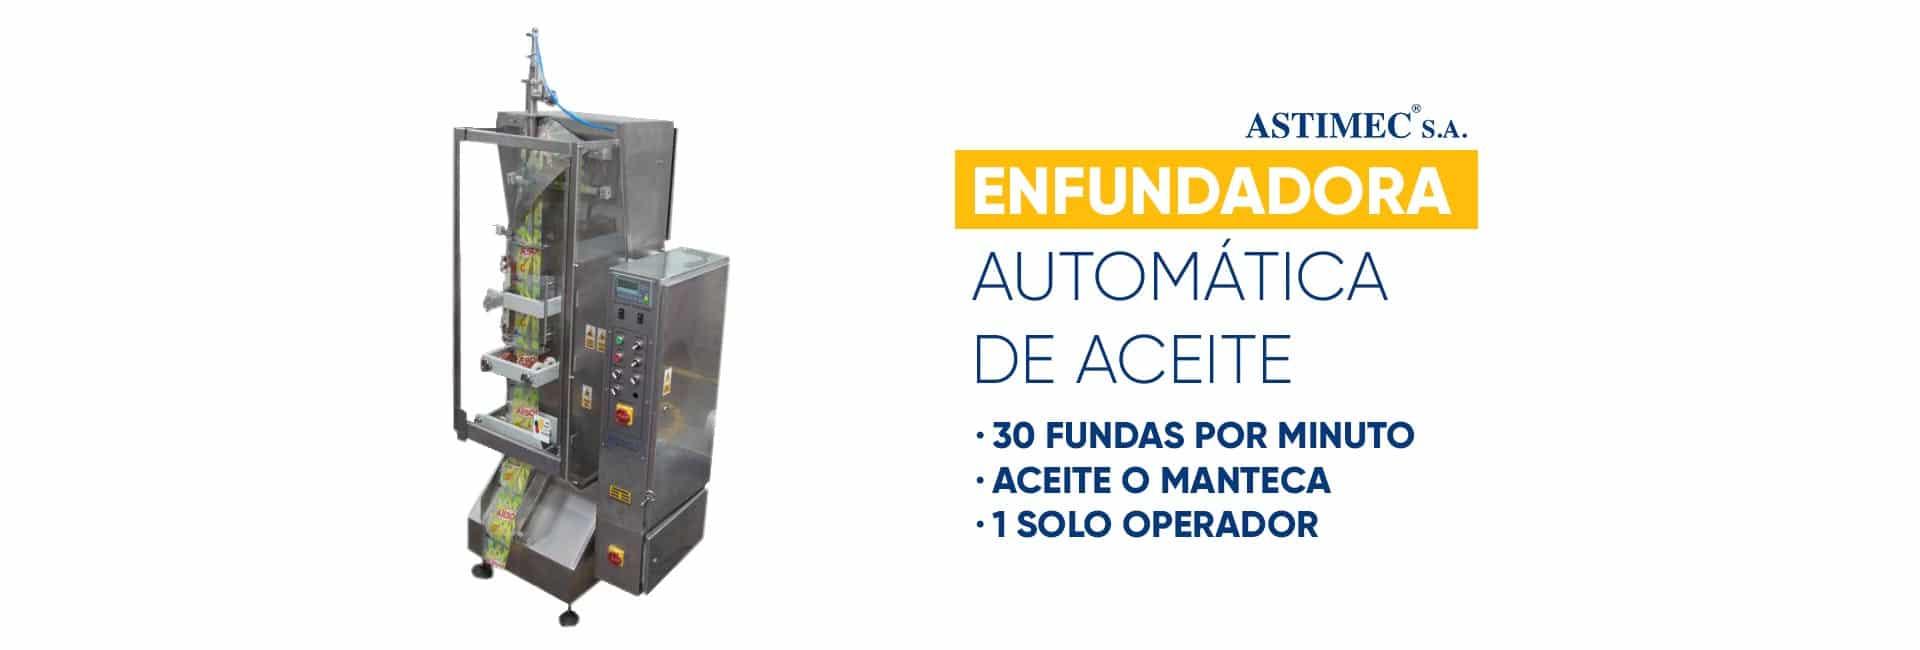 Enfundadora automática de Aceite ASTIMEC